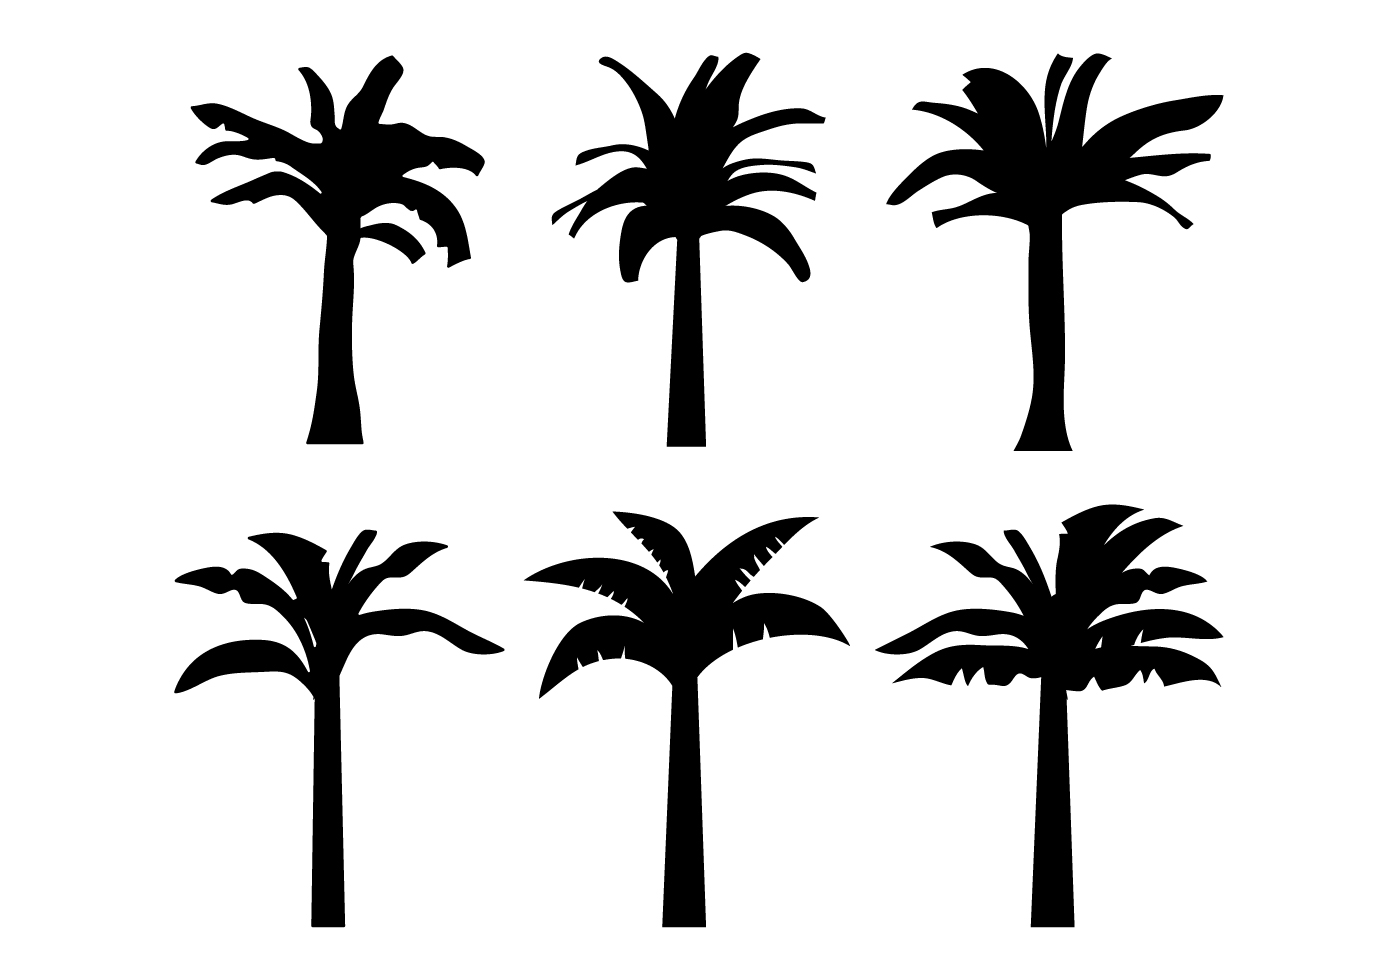 Banana Tree Vector - Download Free Vector Art, Stock ...